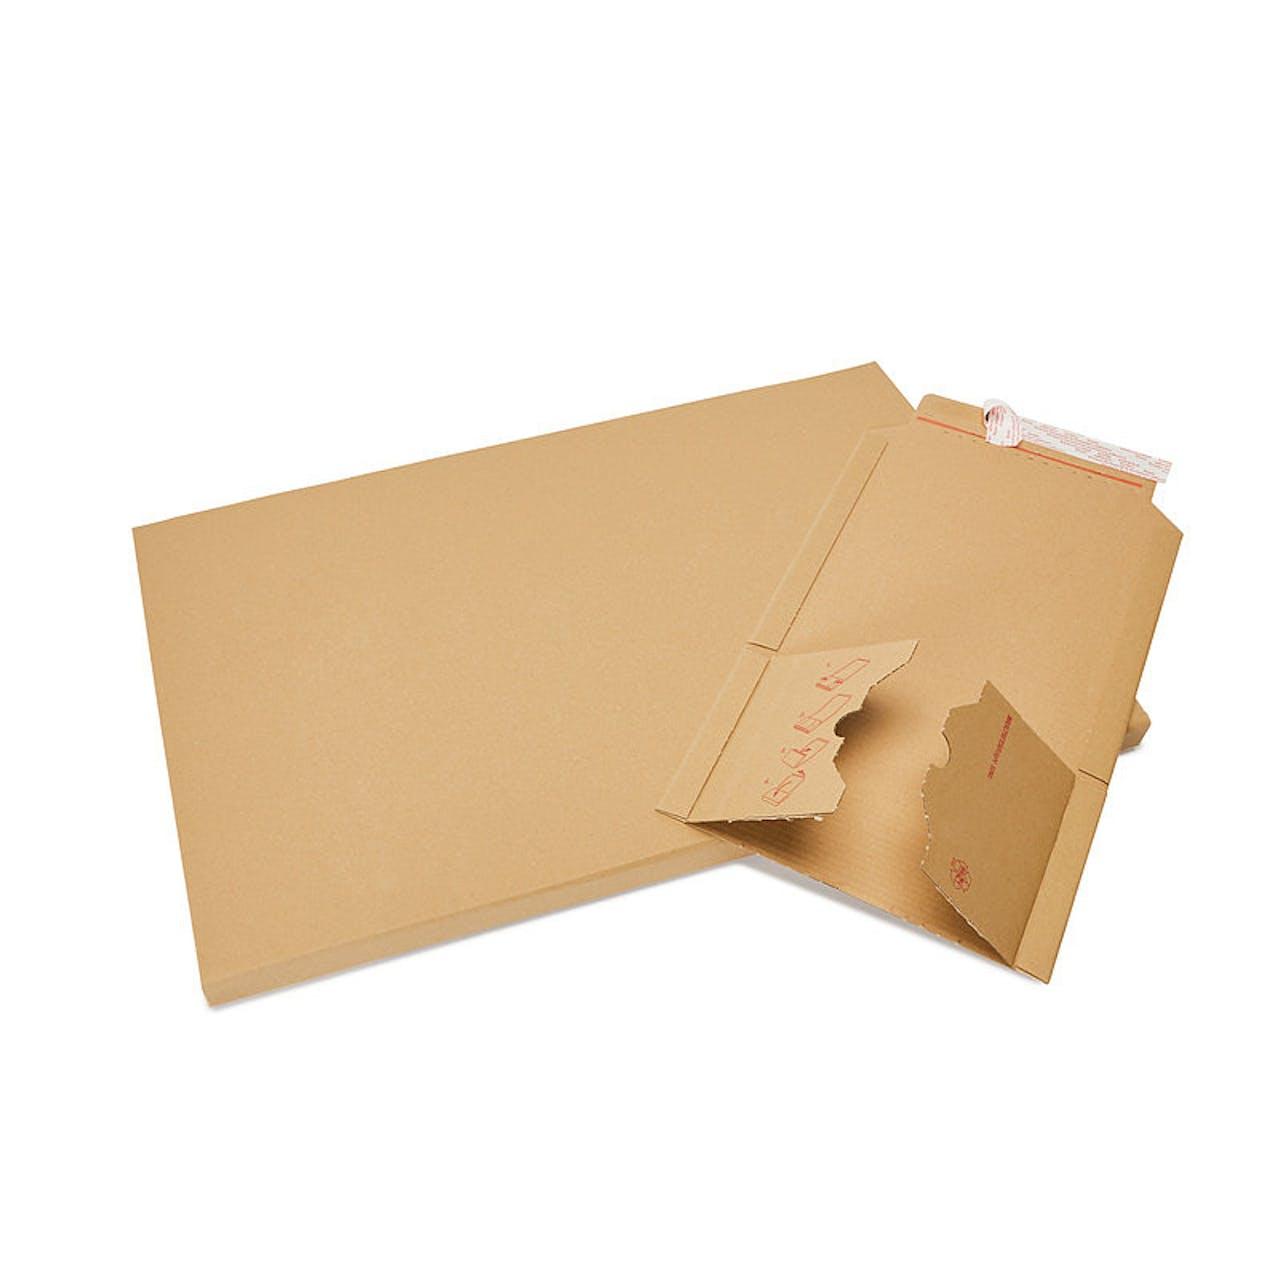 Buchverpackung, braun, 420 x 620 mm, A2 , Füllh. 1–55 mm, 1-fache Selbstkl.